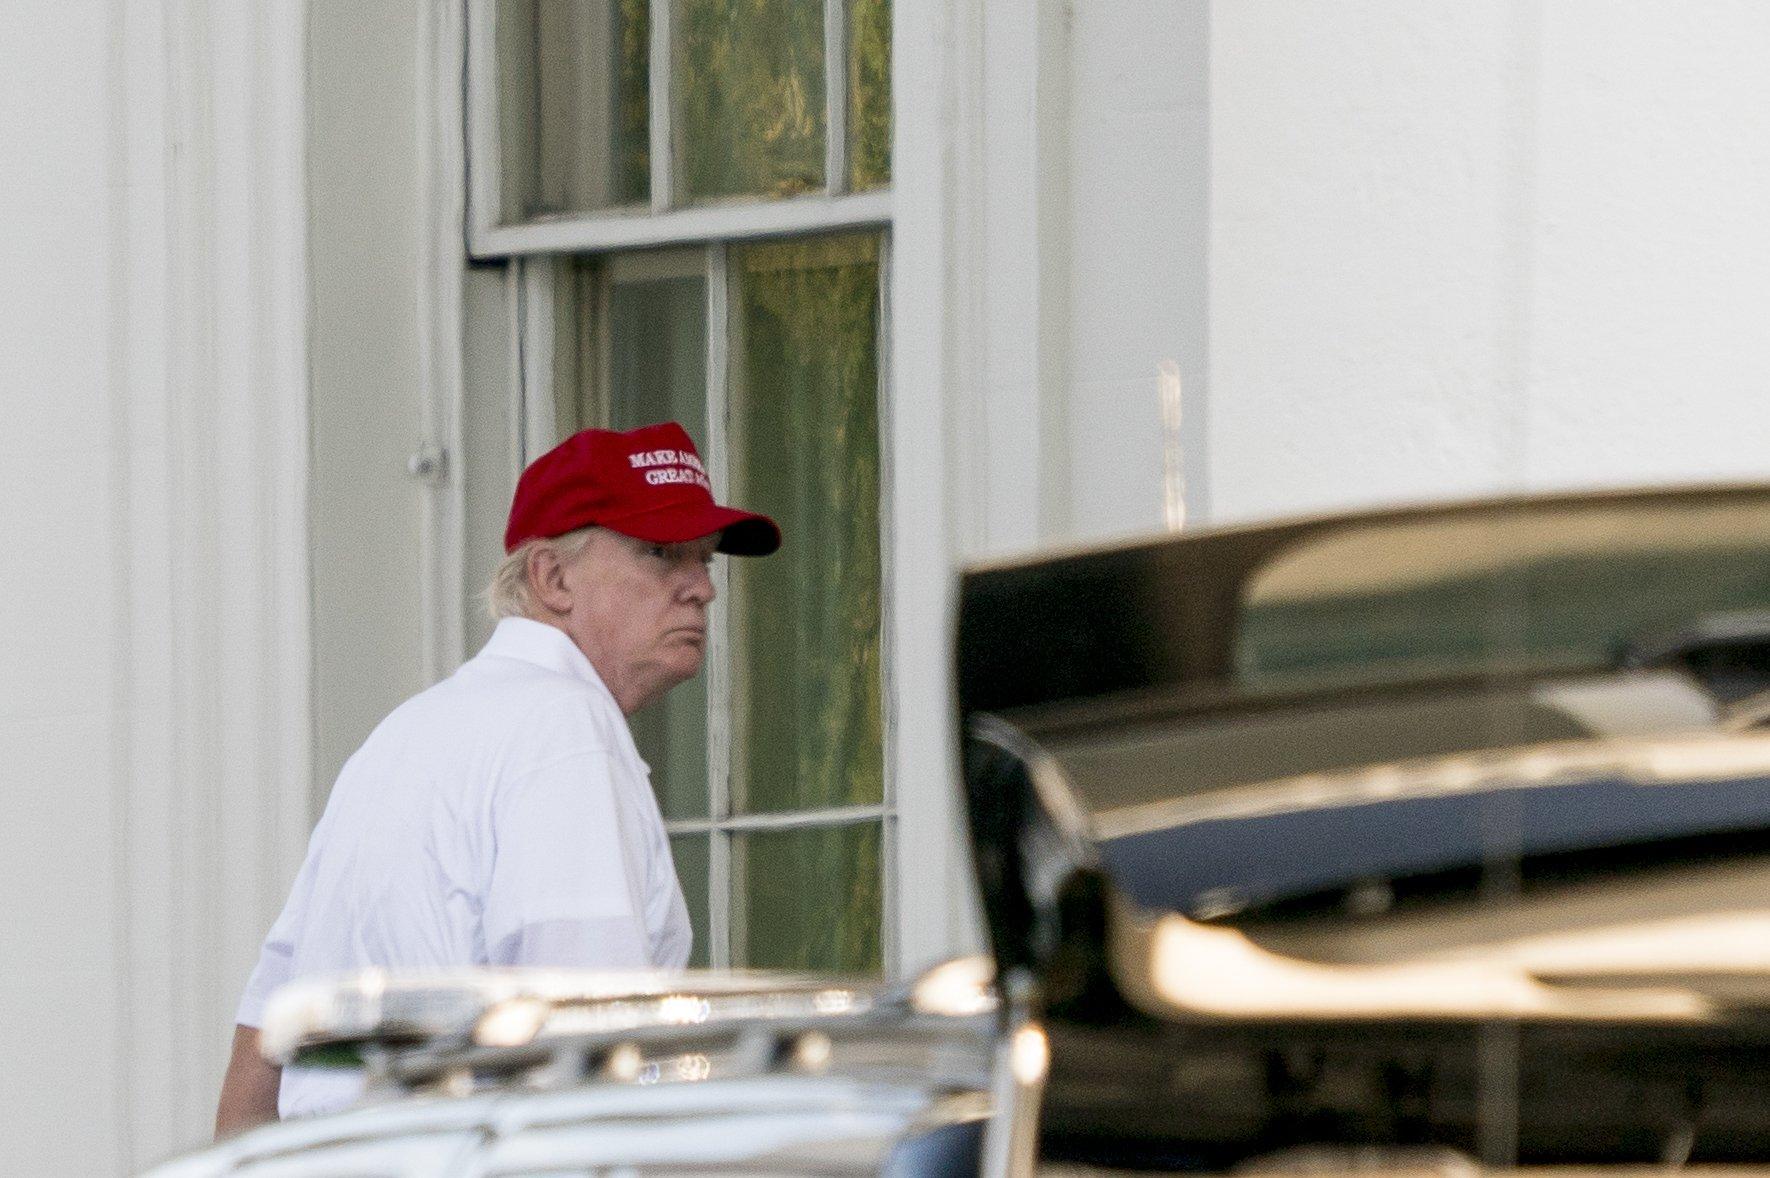 Trump tweets that 401(k) tax incentives 'safe' in tax plan